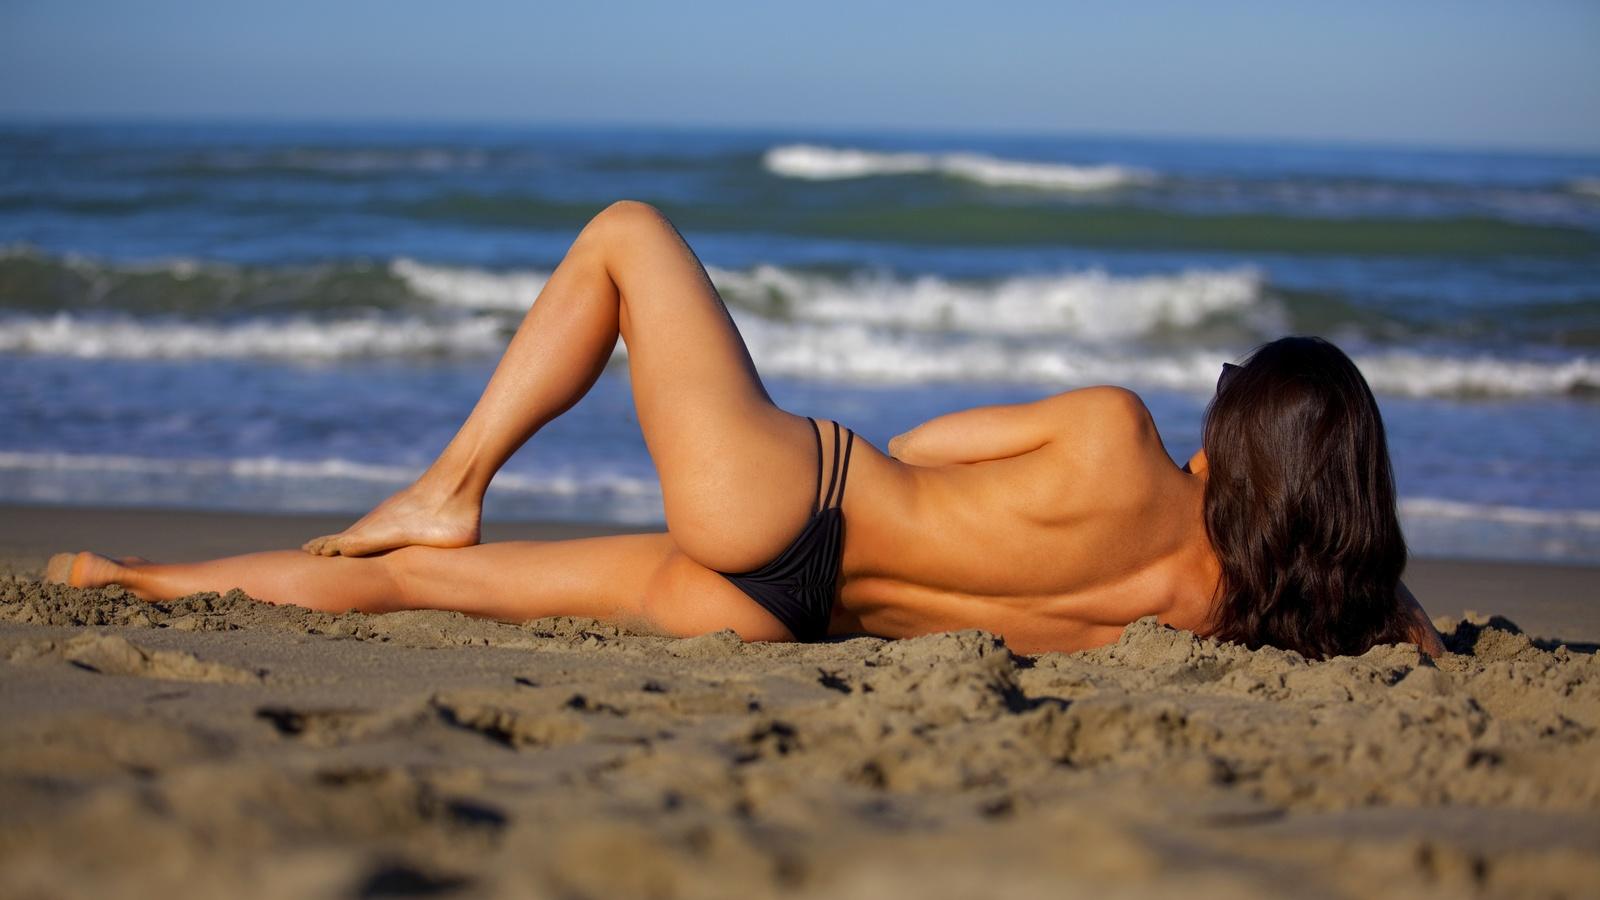 девушка, берег, море, песок